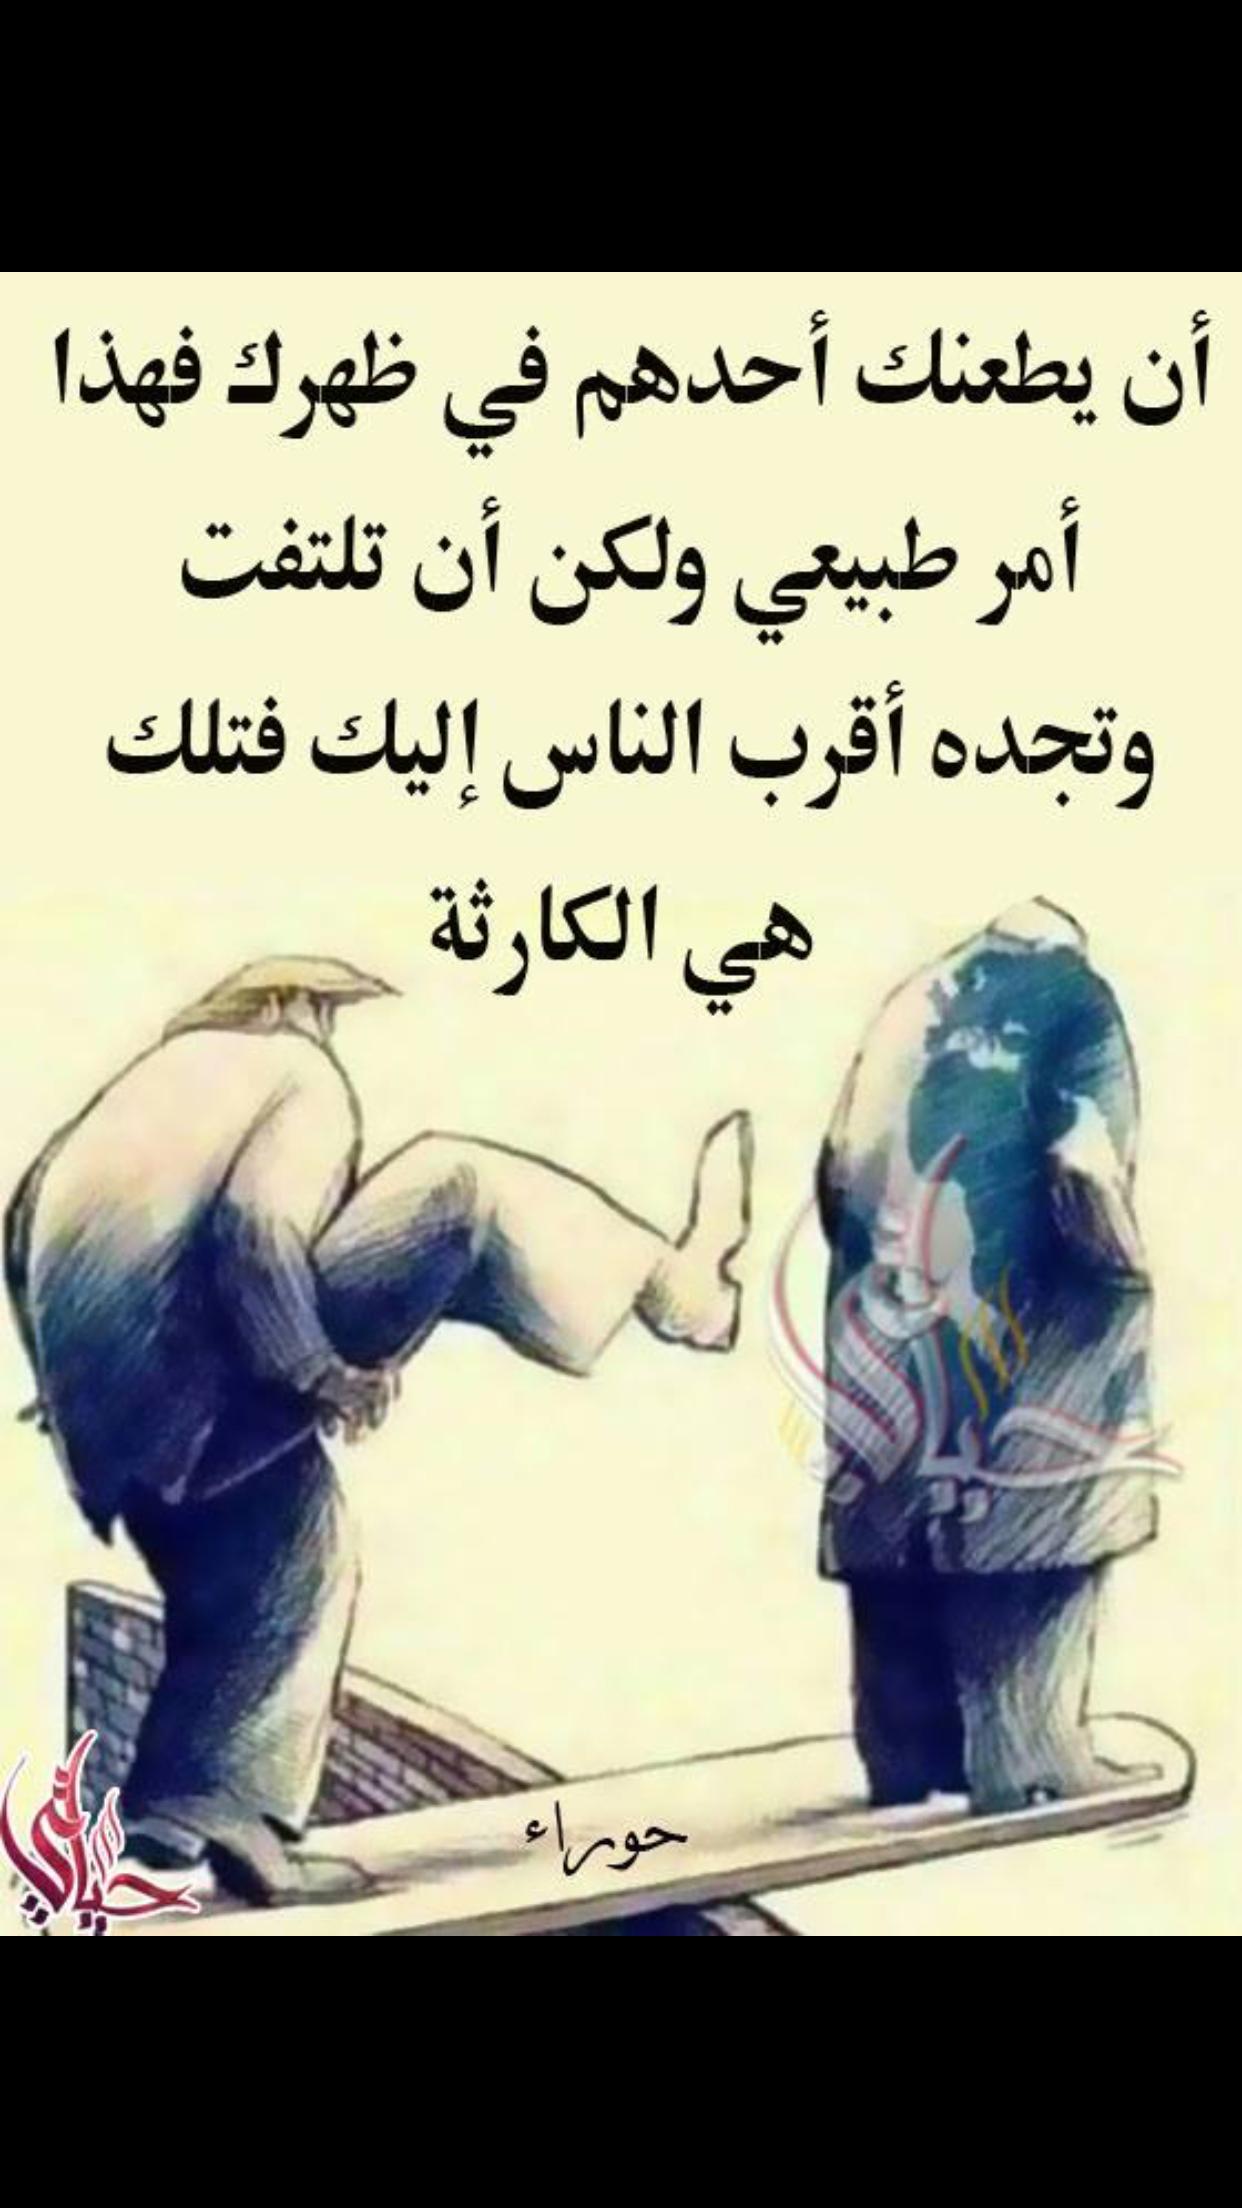 حسبي الله ونعم الوكيل Arabic Quotes Talking Quotes Cool Words